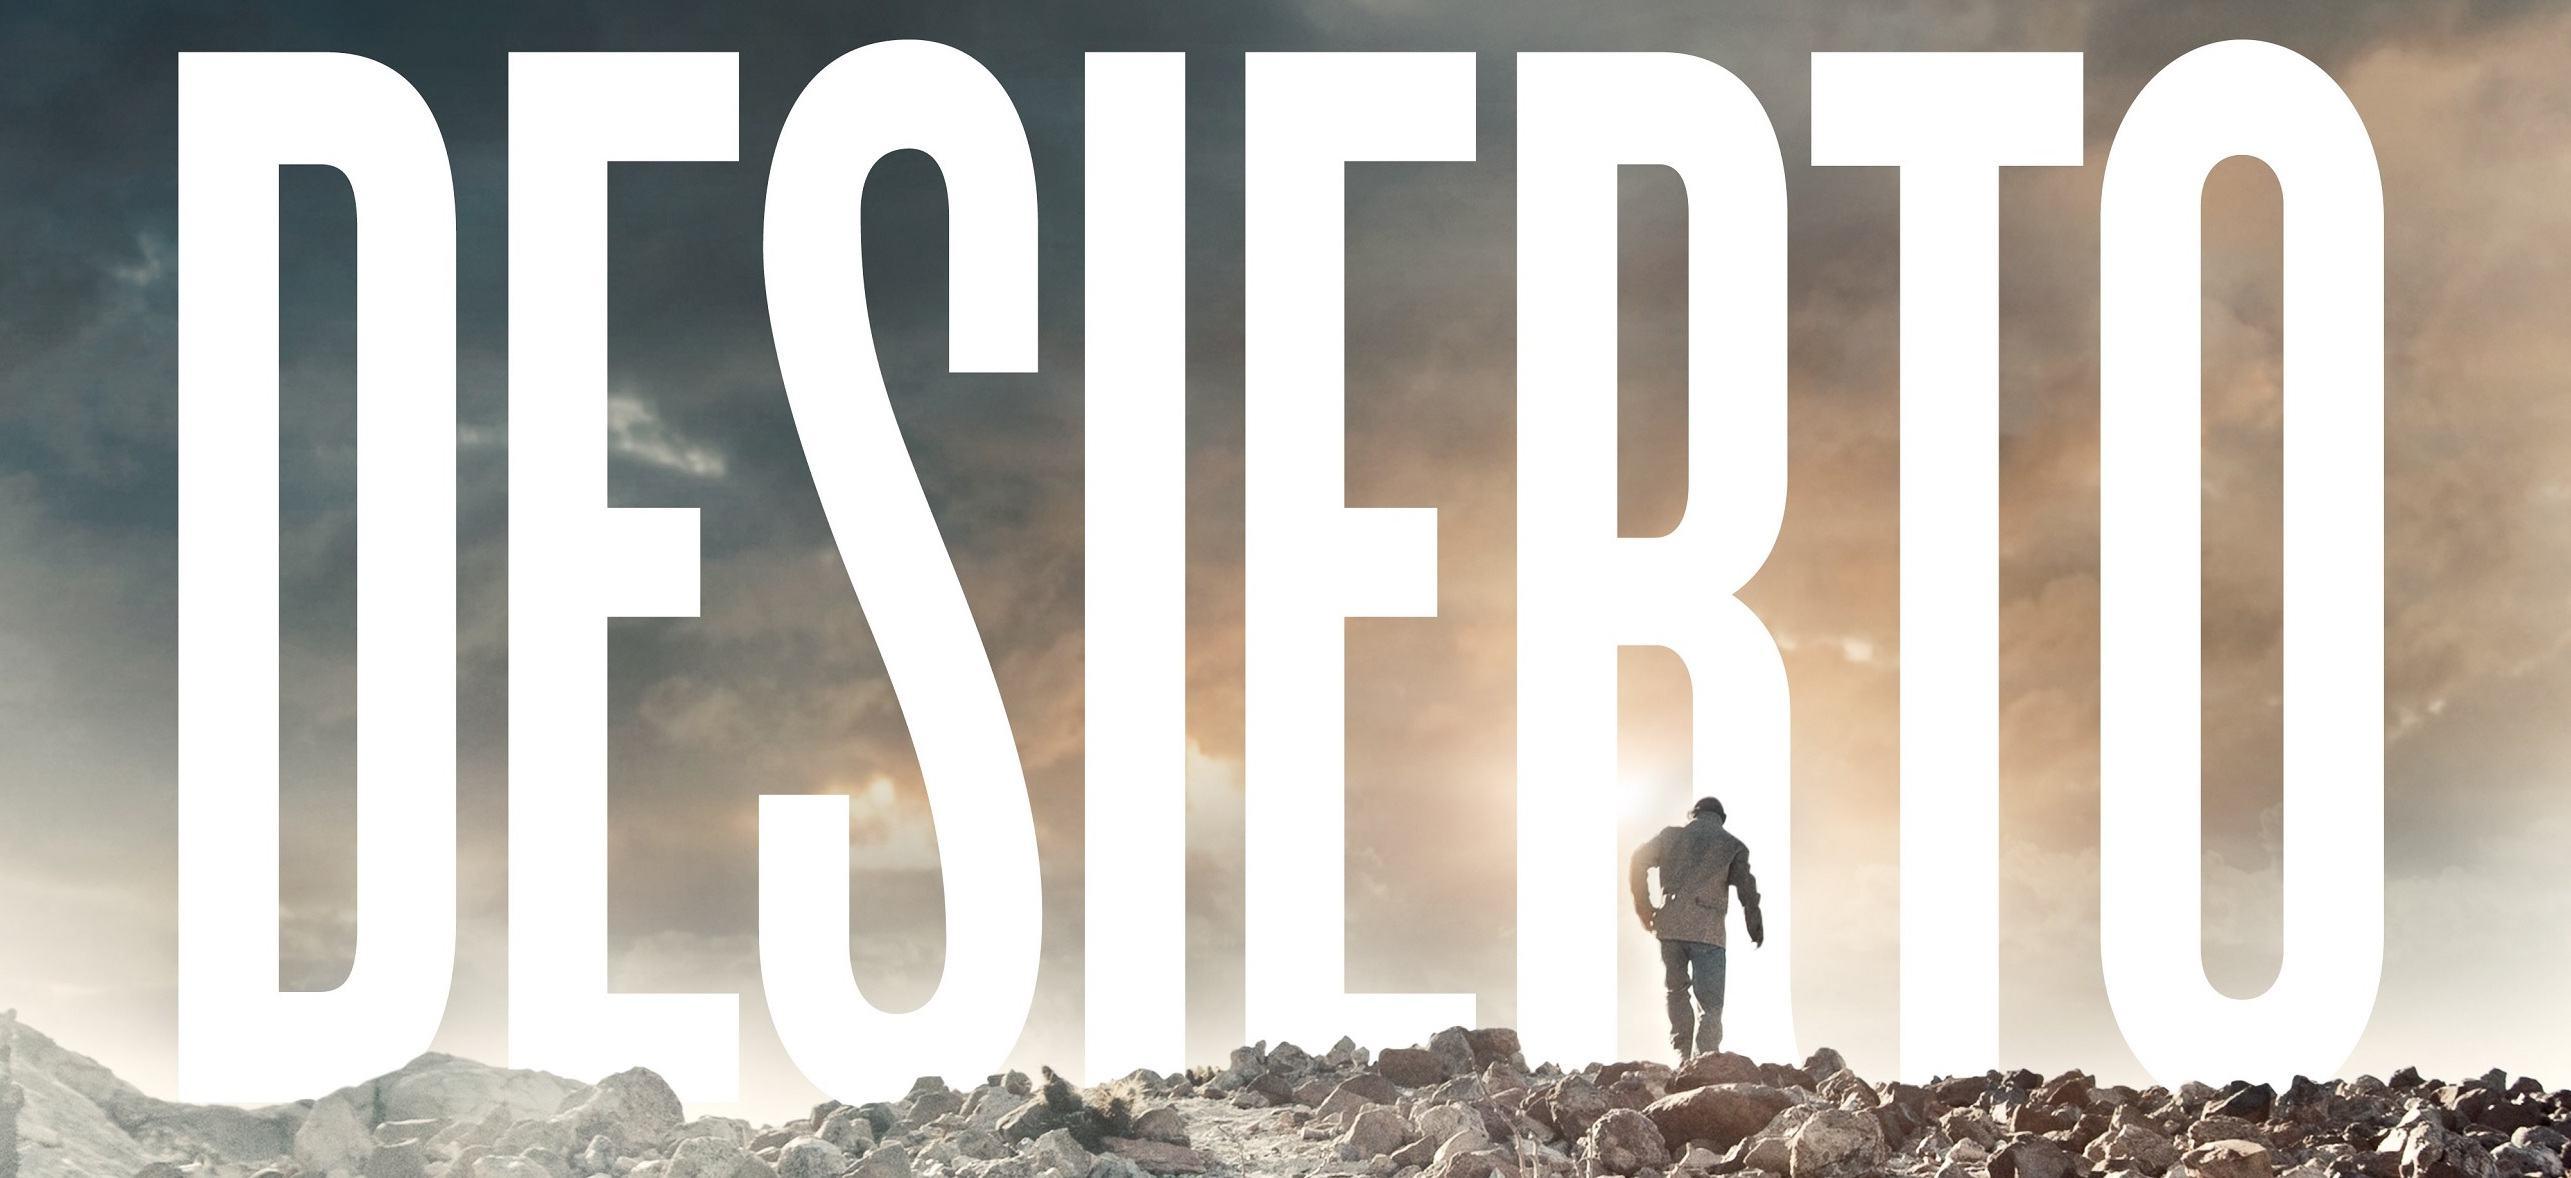 Desierto-Teaser-Poster-Gael-Garcia-Bernal-slice